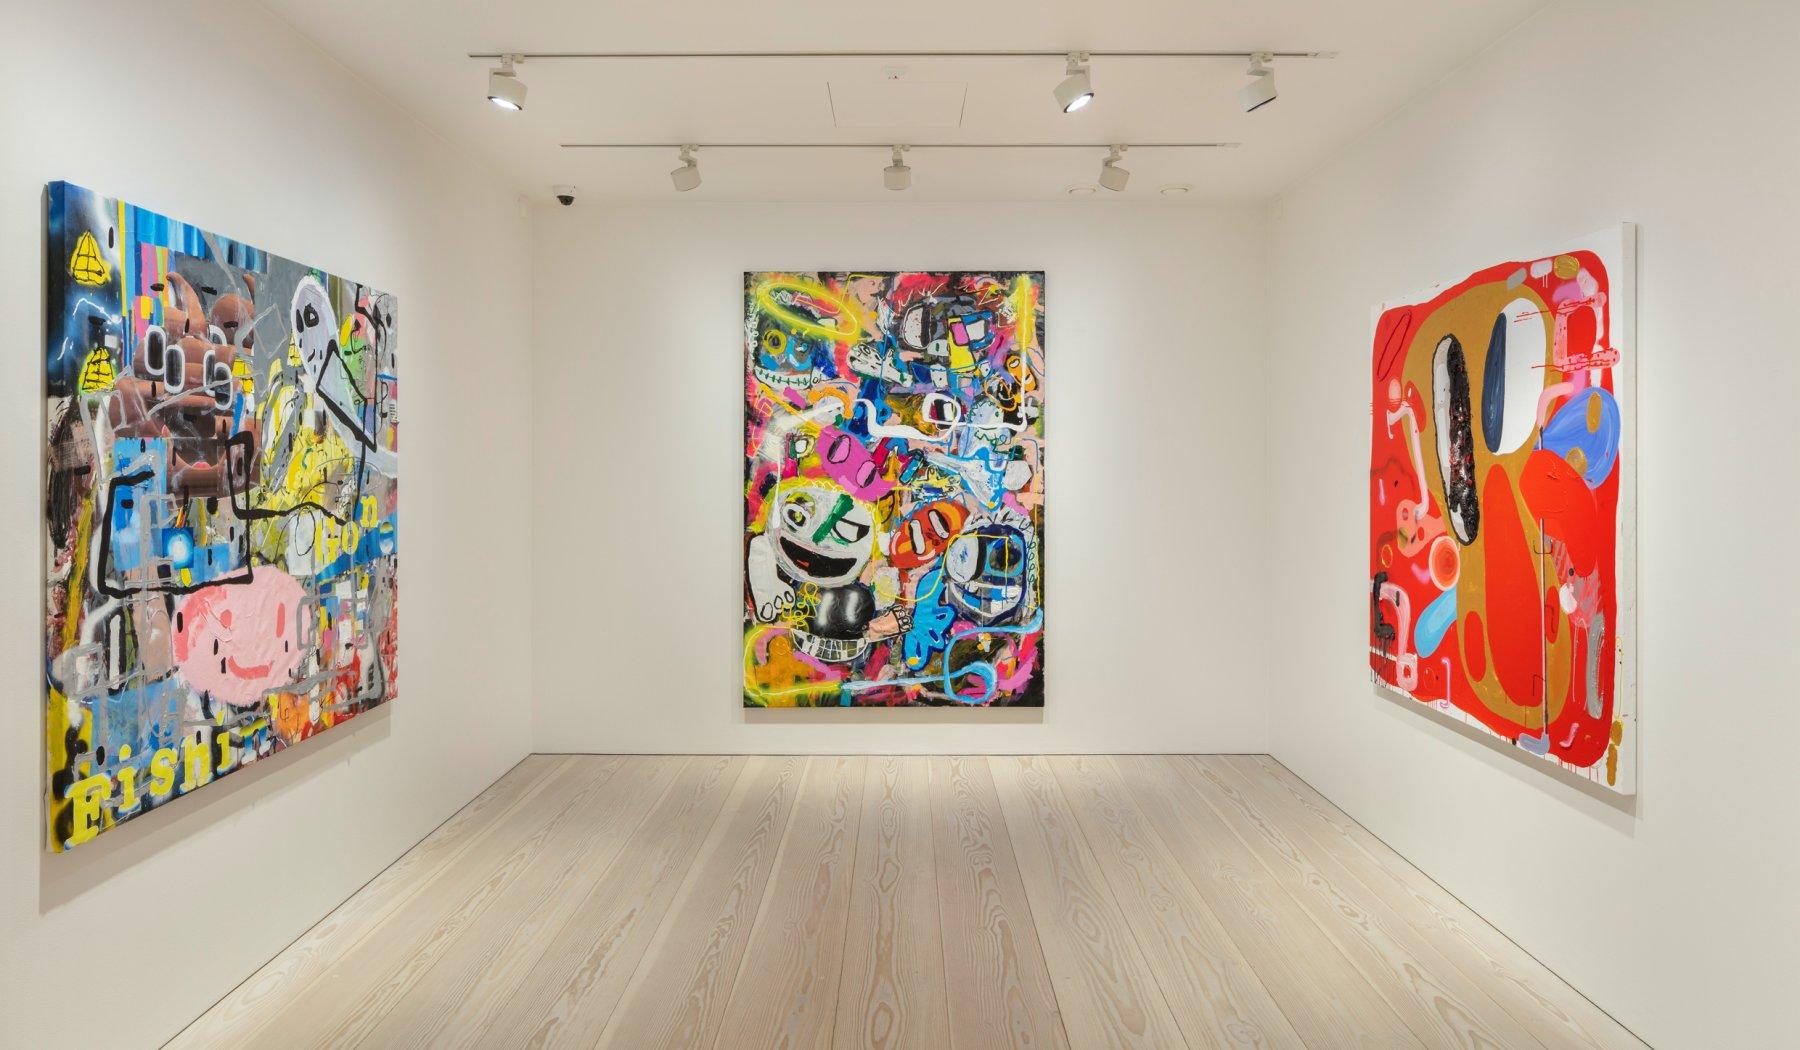 Galerie Forsblom Elias Castren 1